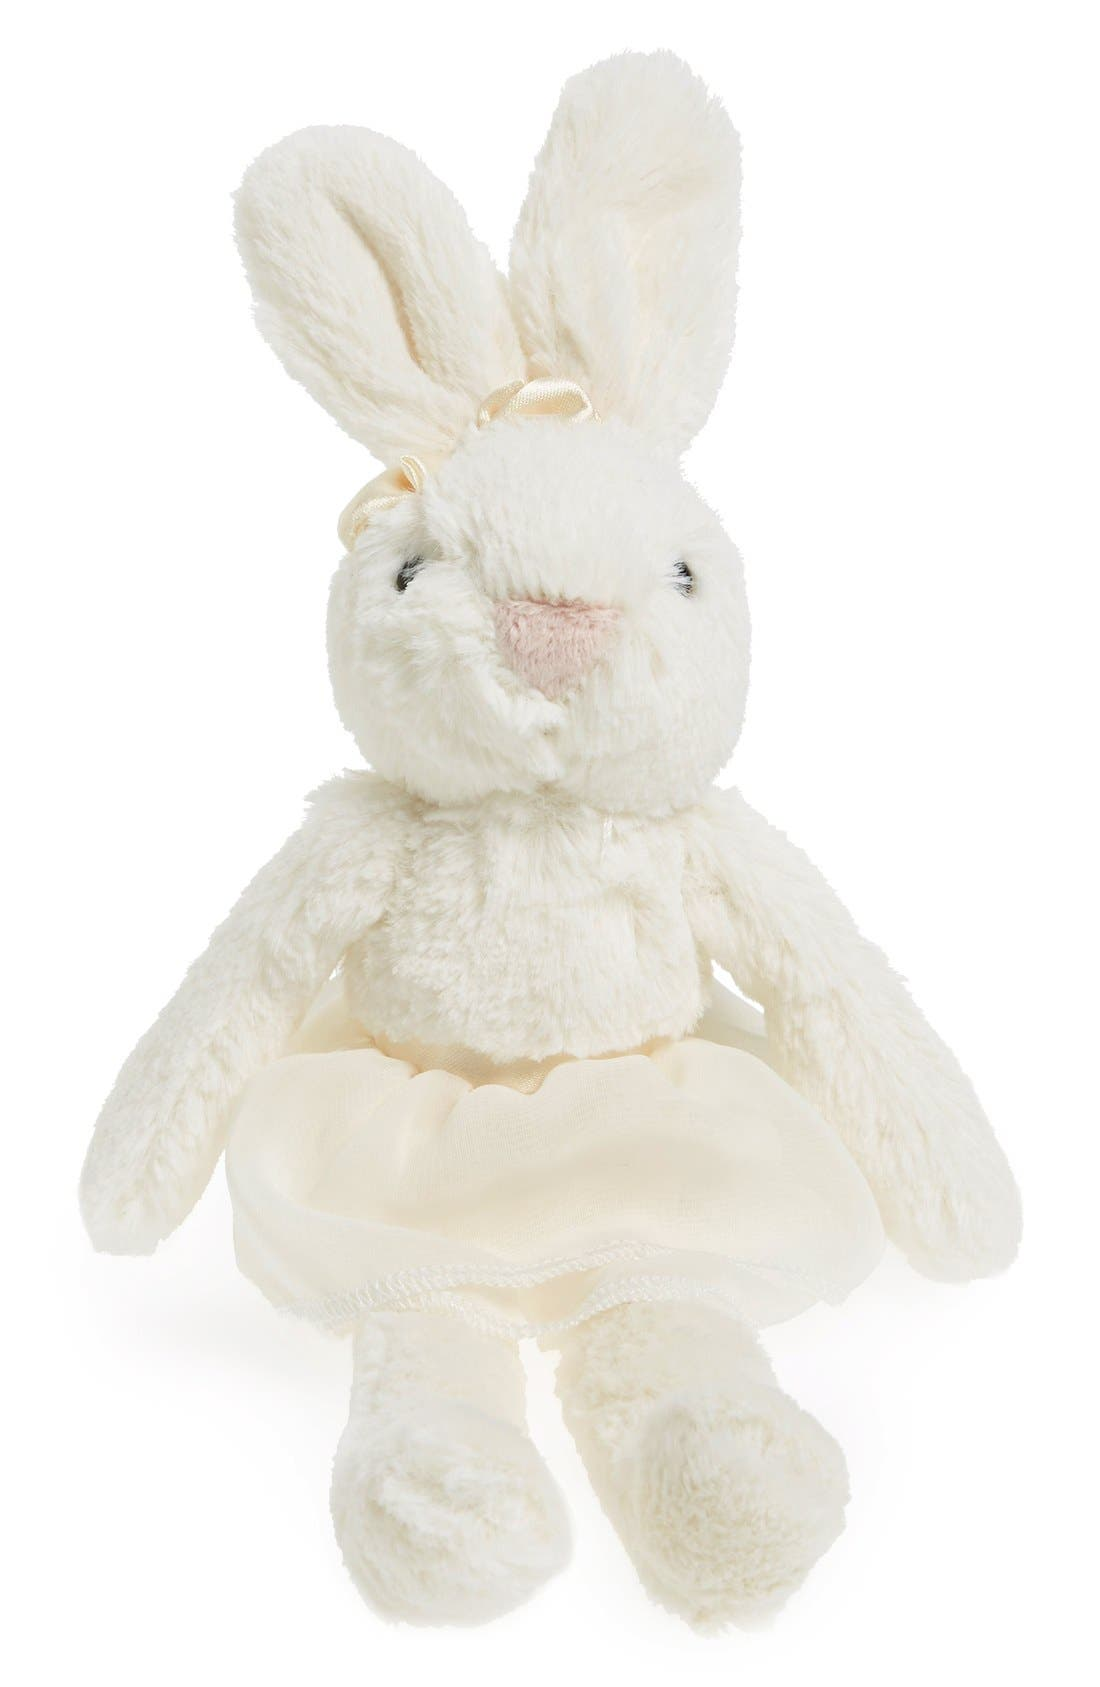 'Plum Bunny' Stuffed Animal,                         Main,                         color, Cream